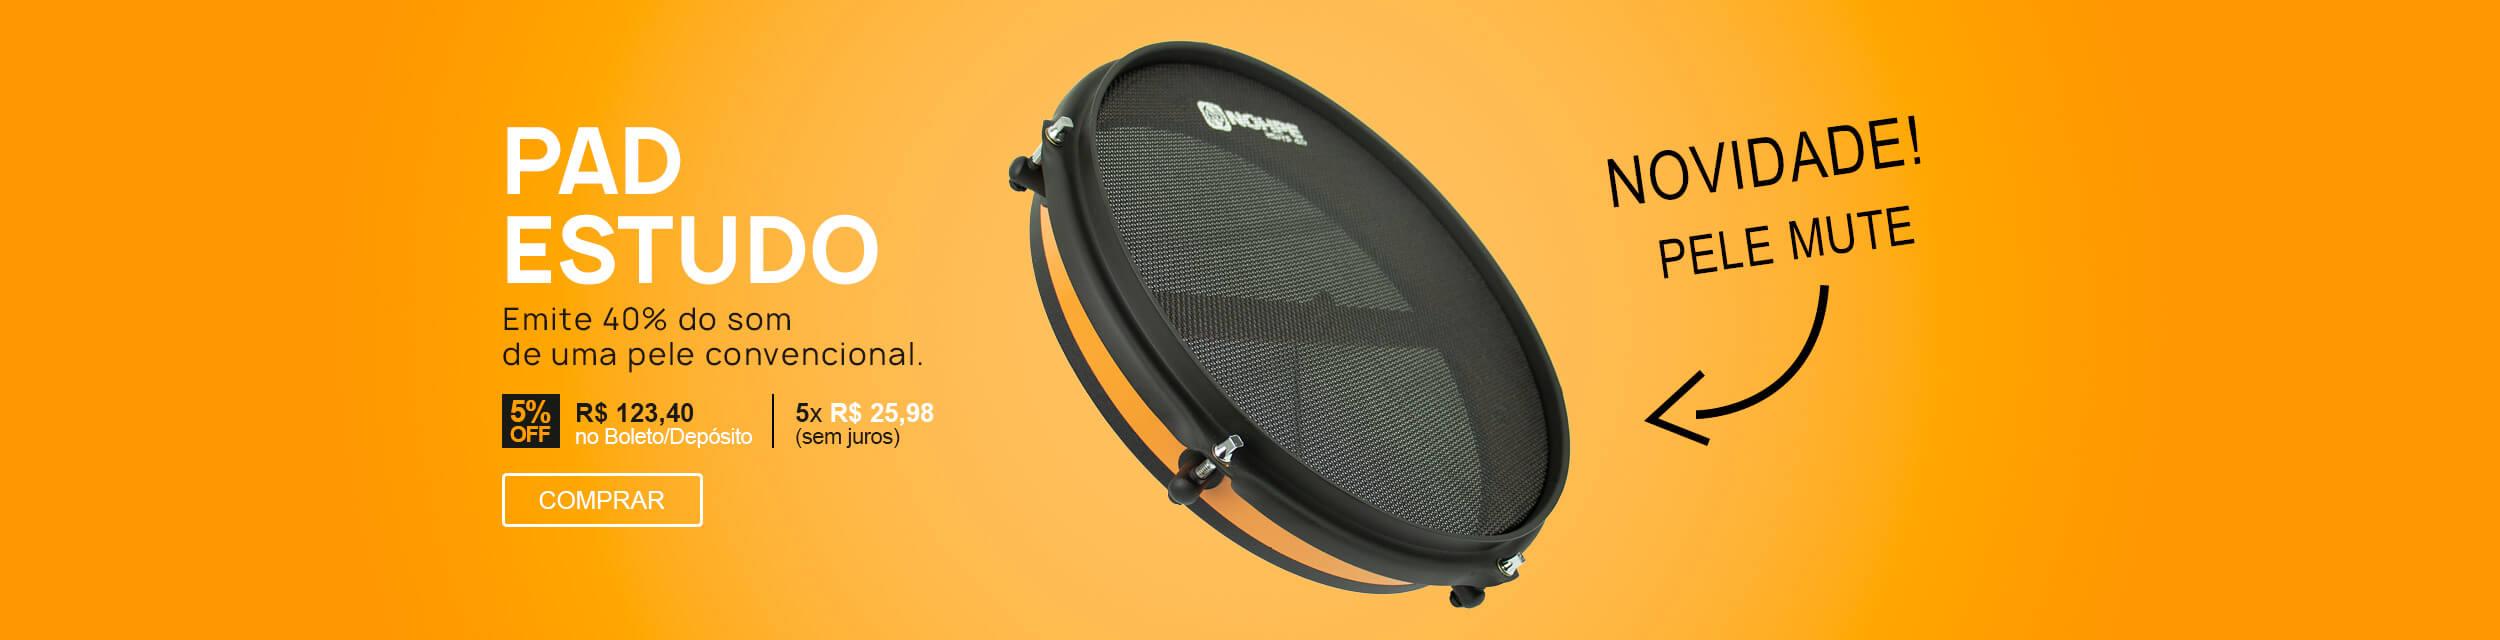 F - Pad Laranja Estudo Pele MutE Luen Percussion